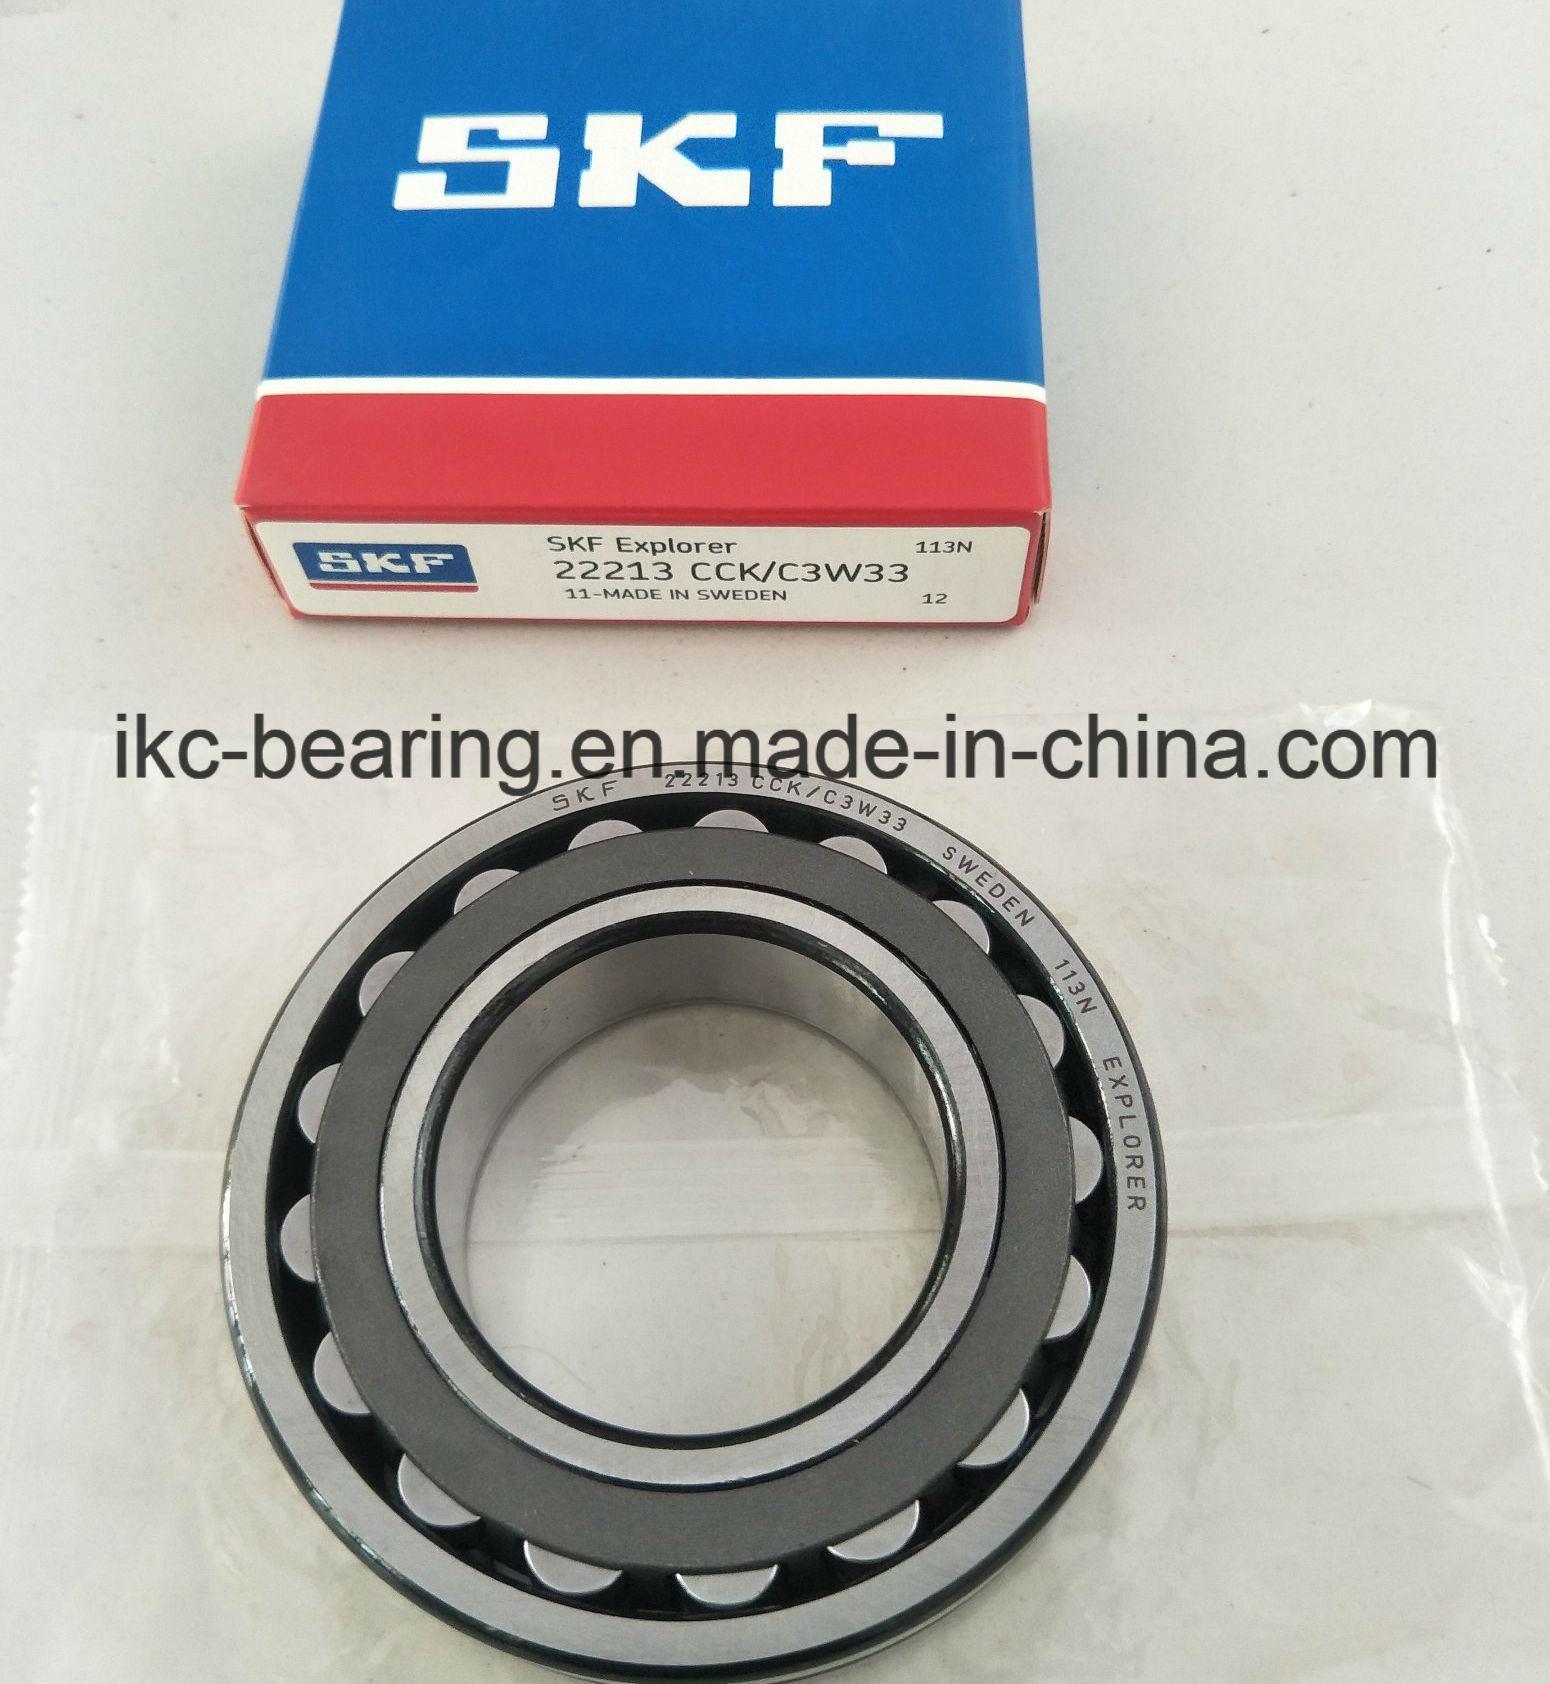 China SKF 22213cck/W33/C3 Spherical Roller Bearing 22213ck, 22213K,  22213ek, 22213 Cck, Ck, Ek - China SKF 21307cck/W33/C3 Bearings, SKF  21308cck/W33/C3 ...